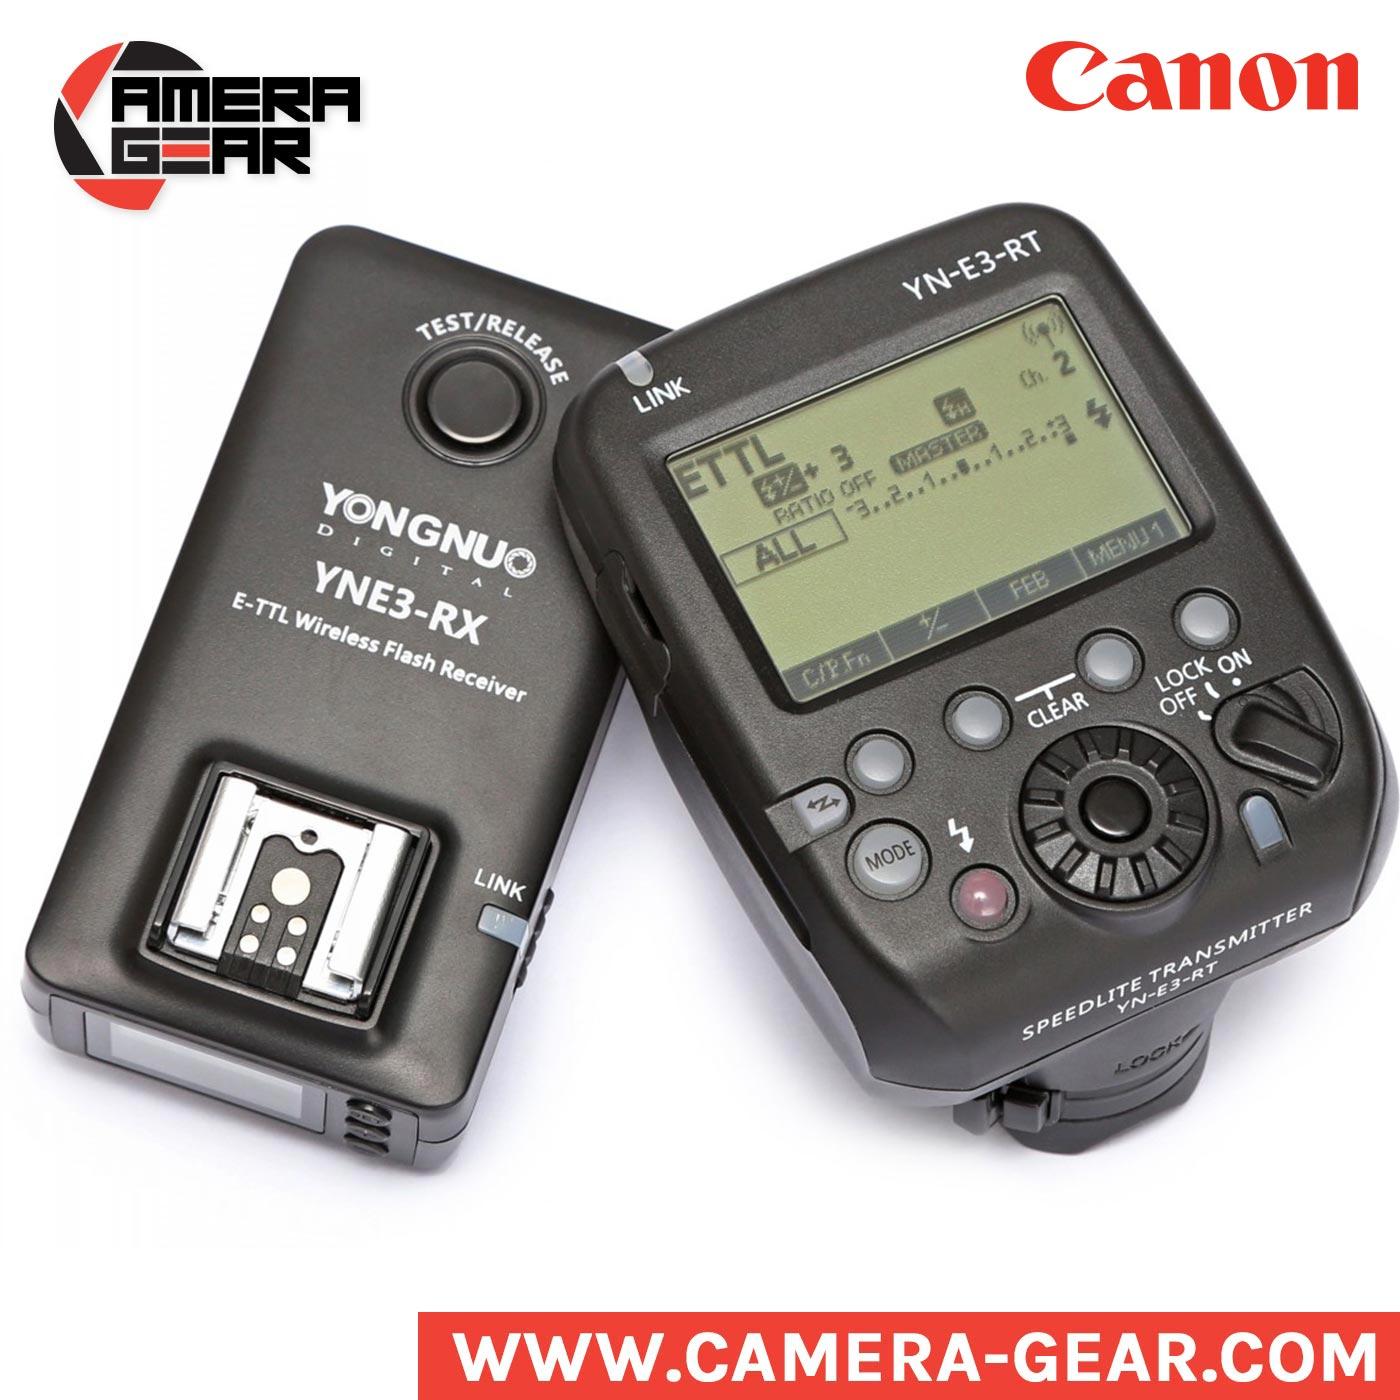 Yongnuo Yne3 Rx Wireless Radio Receiver For Canon Camera Gear Yn 565ex Ii Ttl Lcd Rt System